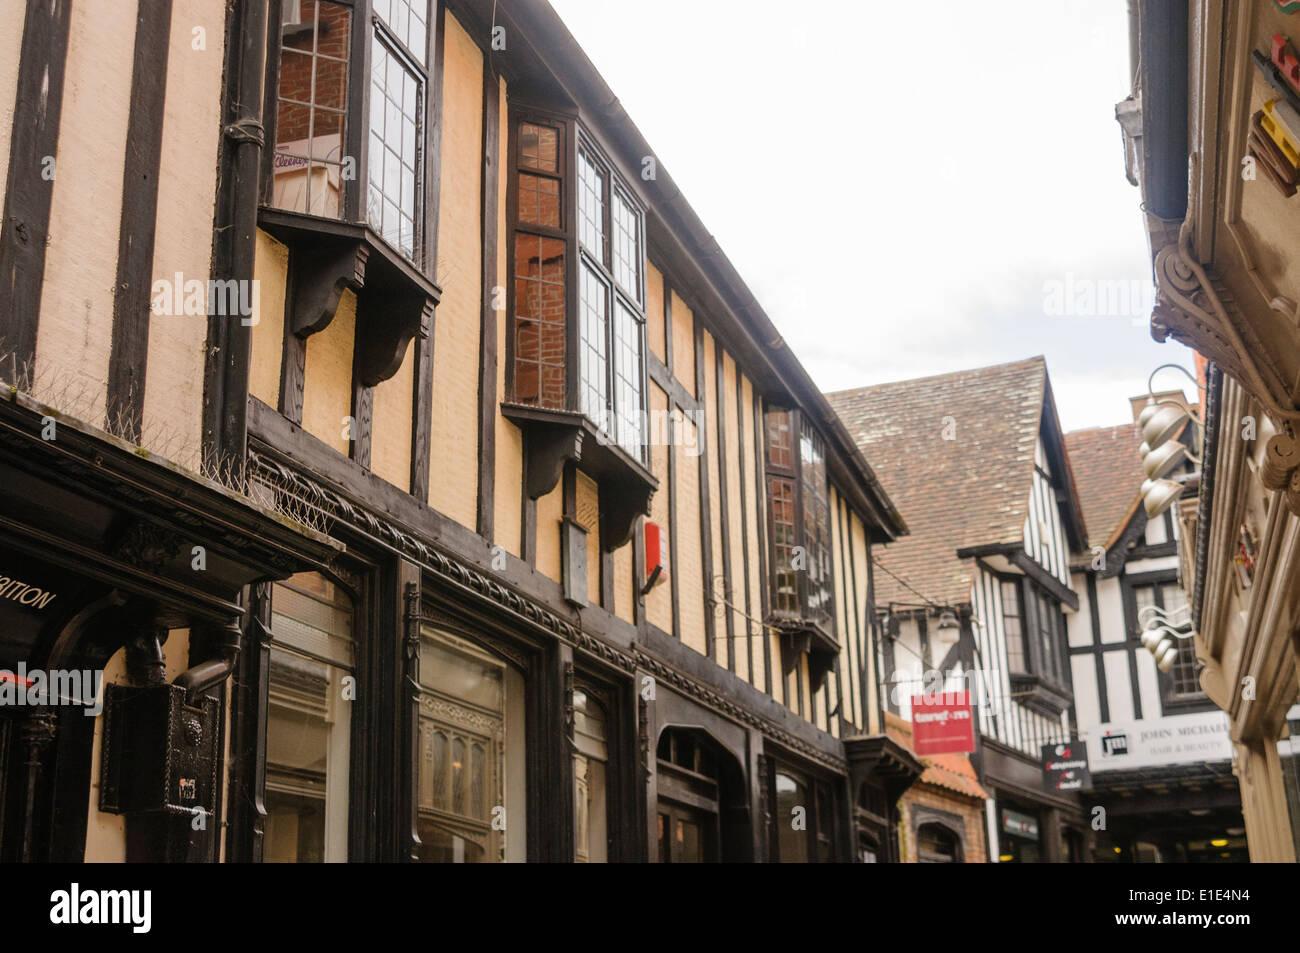 Tudor buildings in Ipswich - Stock Image